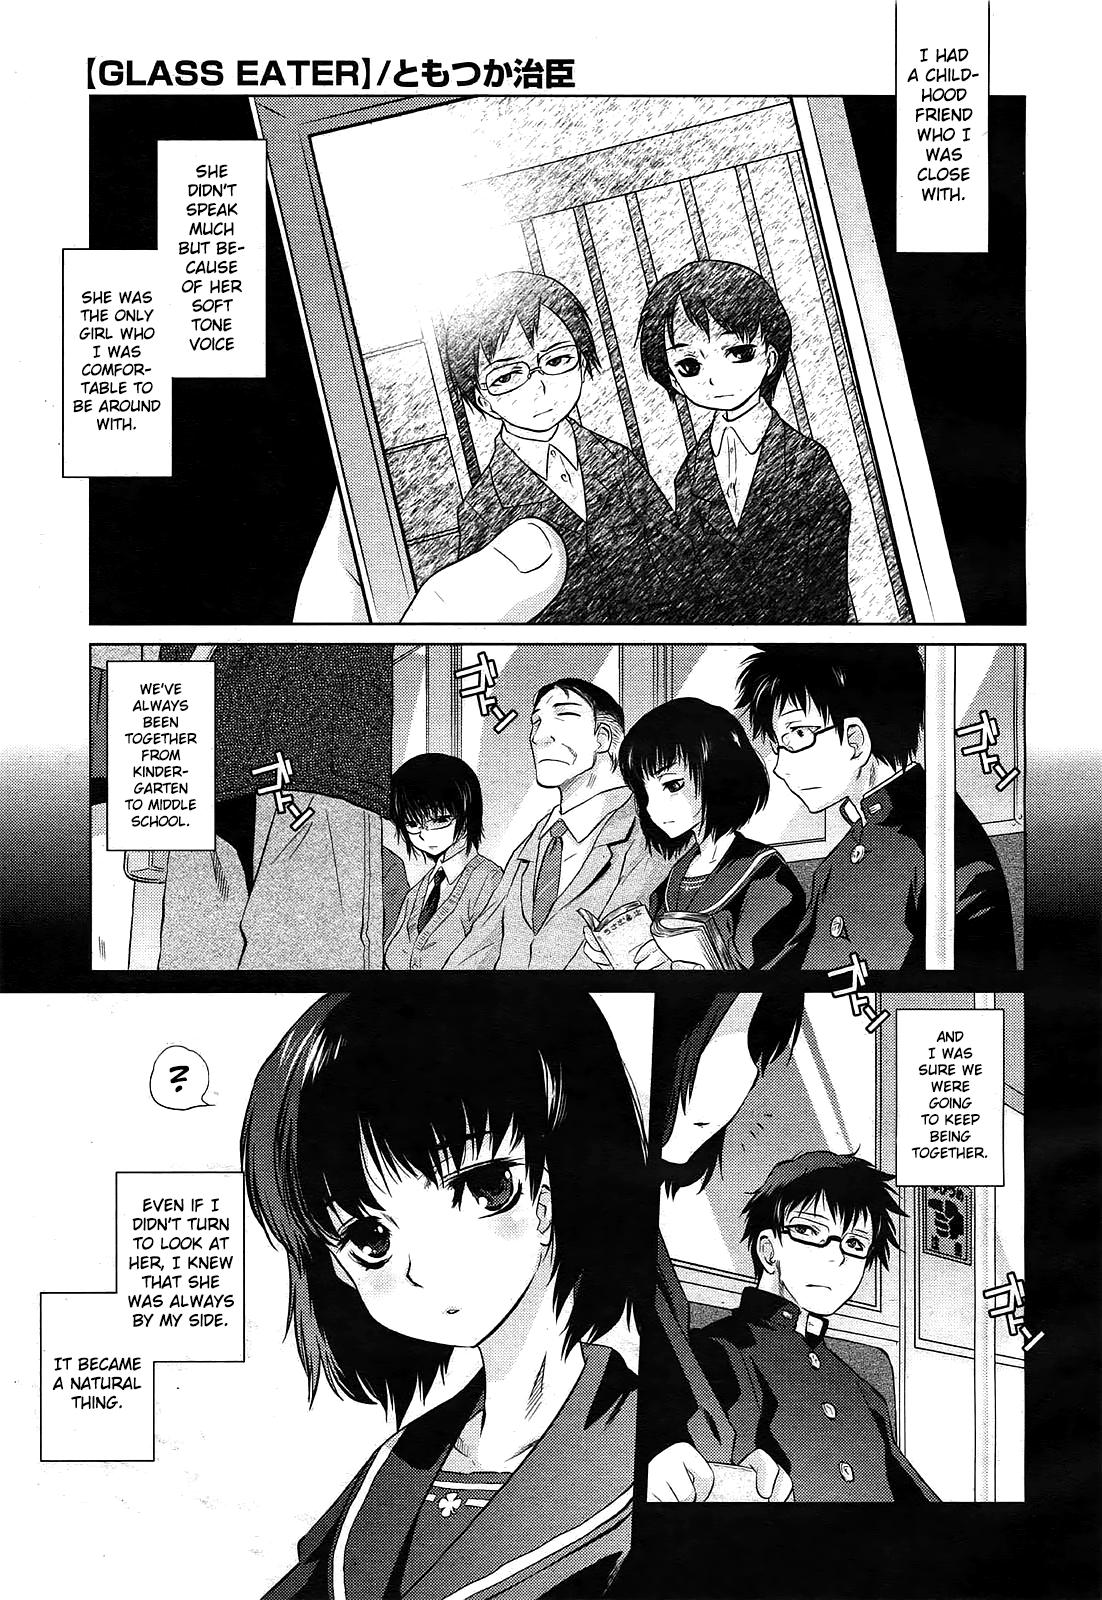 Glass Eater [ともつか治臣] (コミックゼロエクス Vol.30 2010年6月号) [英訳] 0